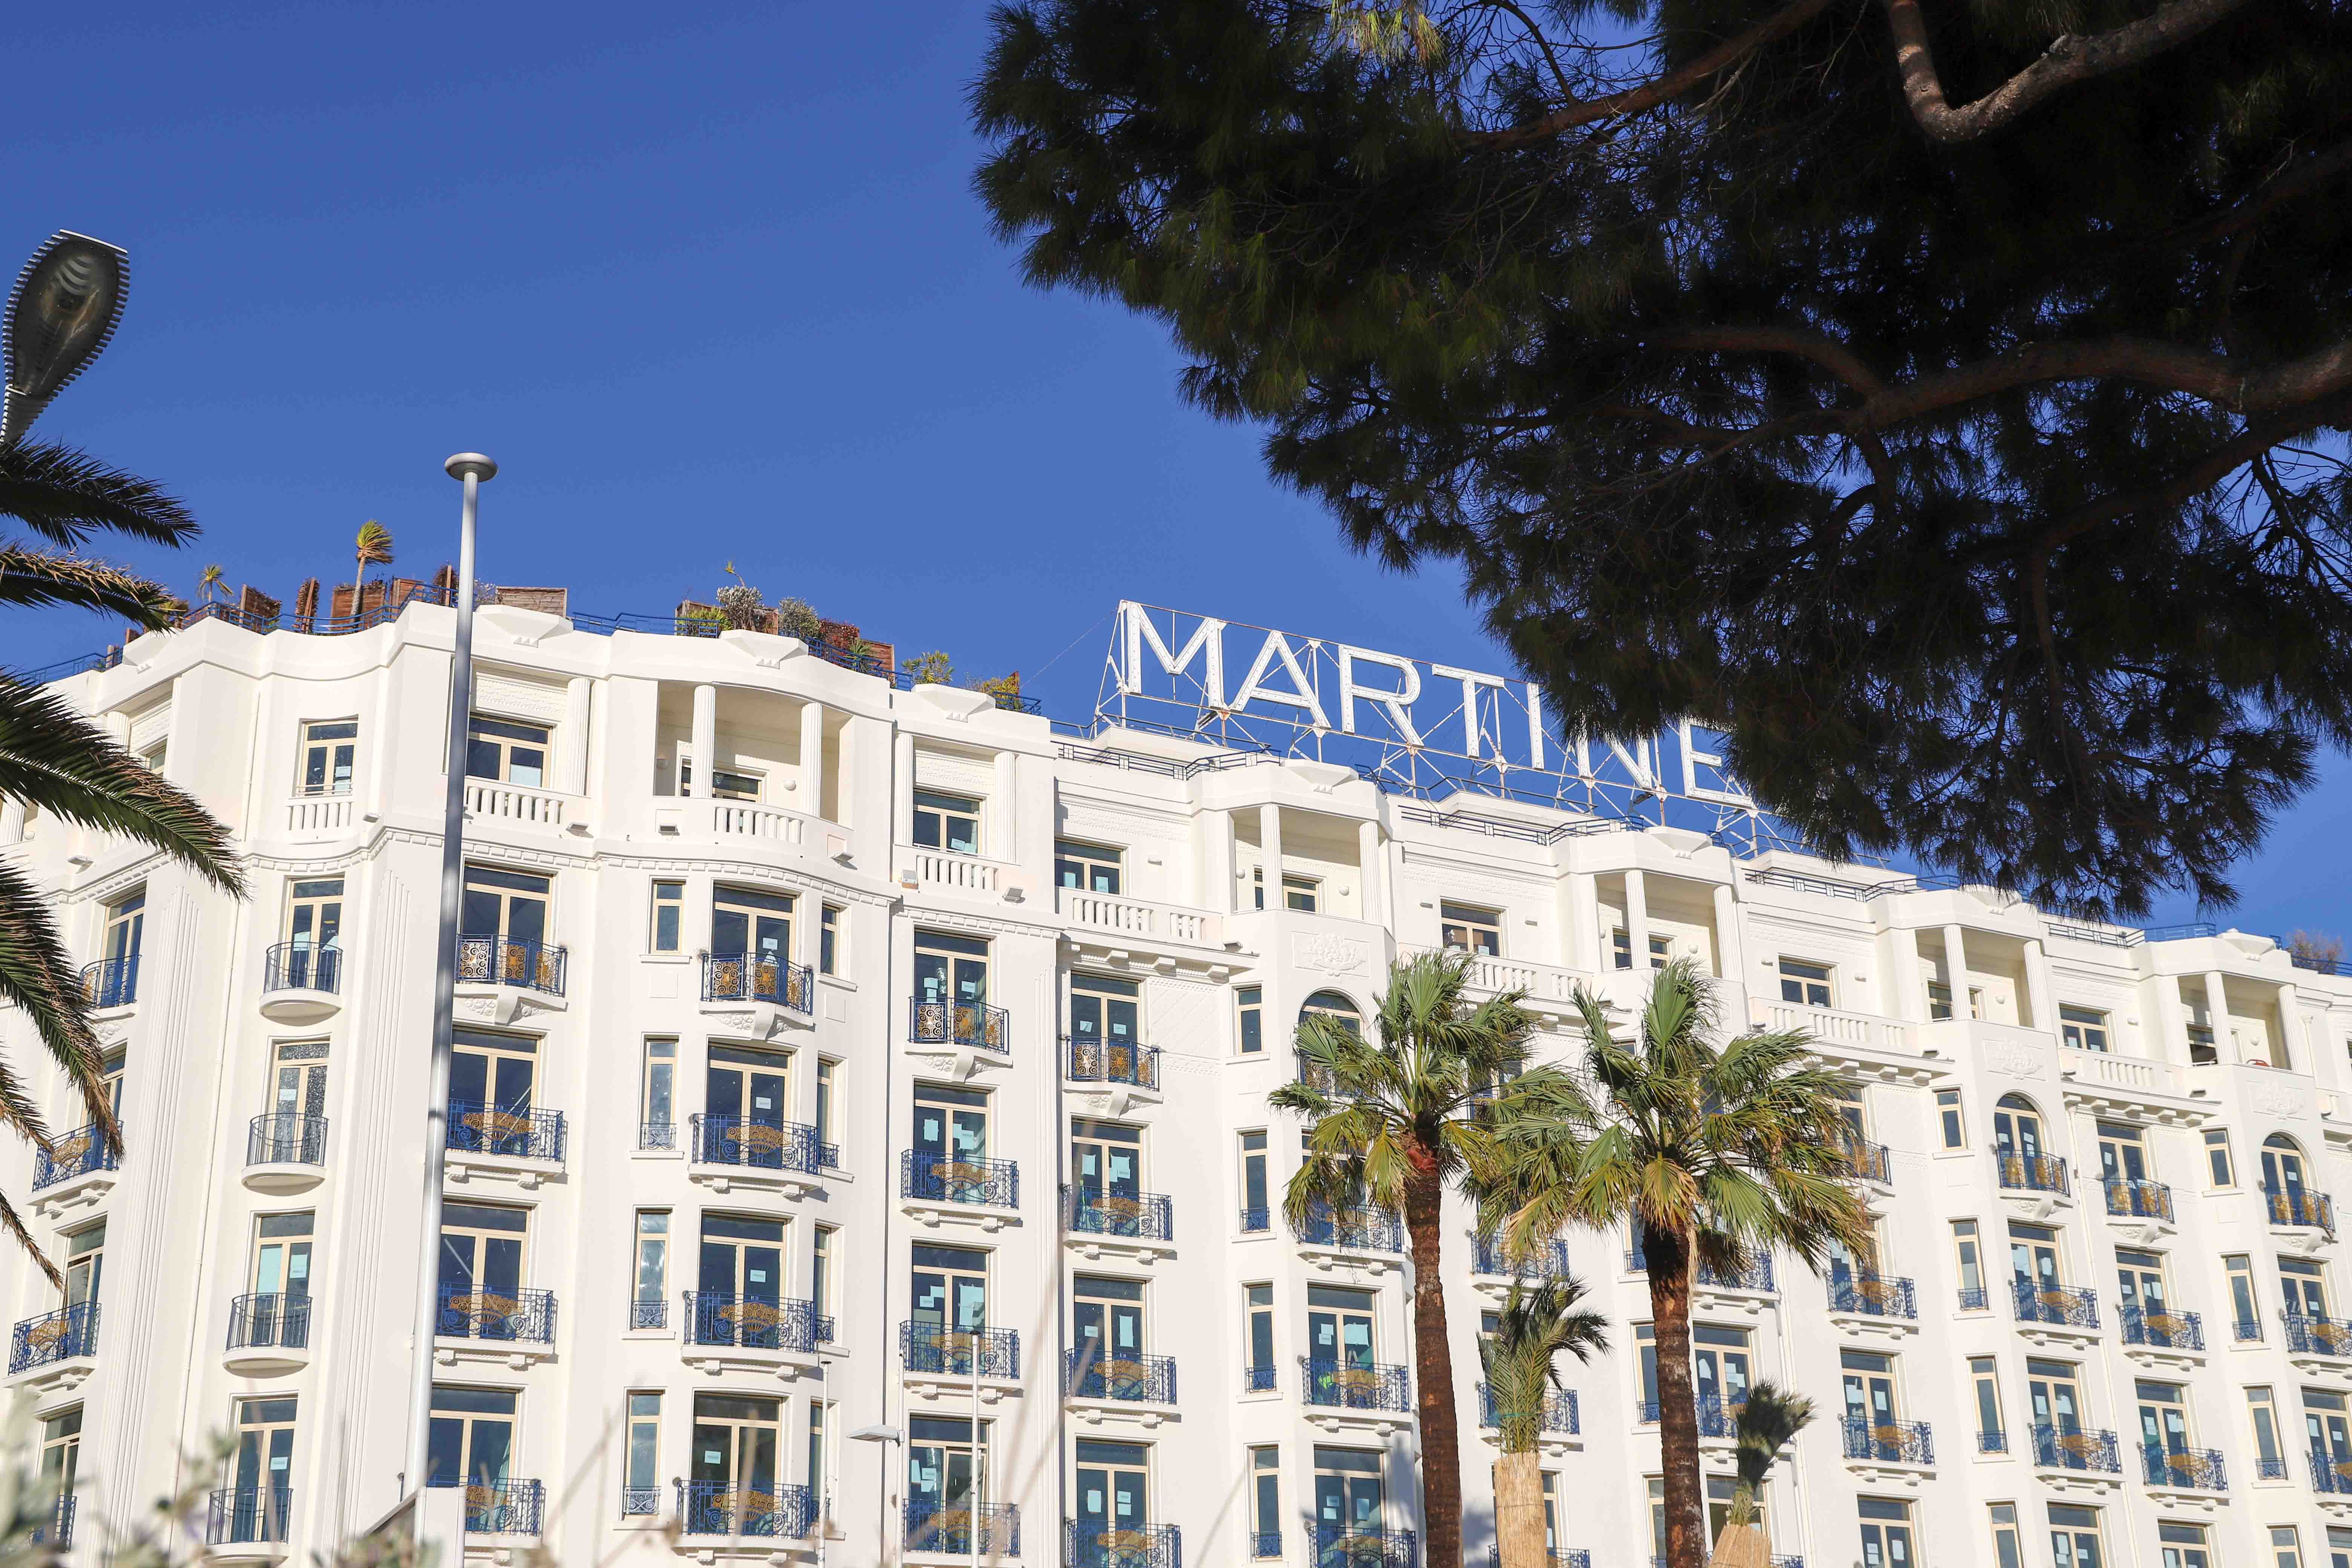 Martinez hotel Cannes